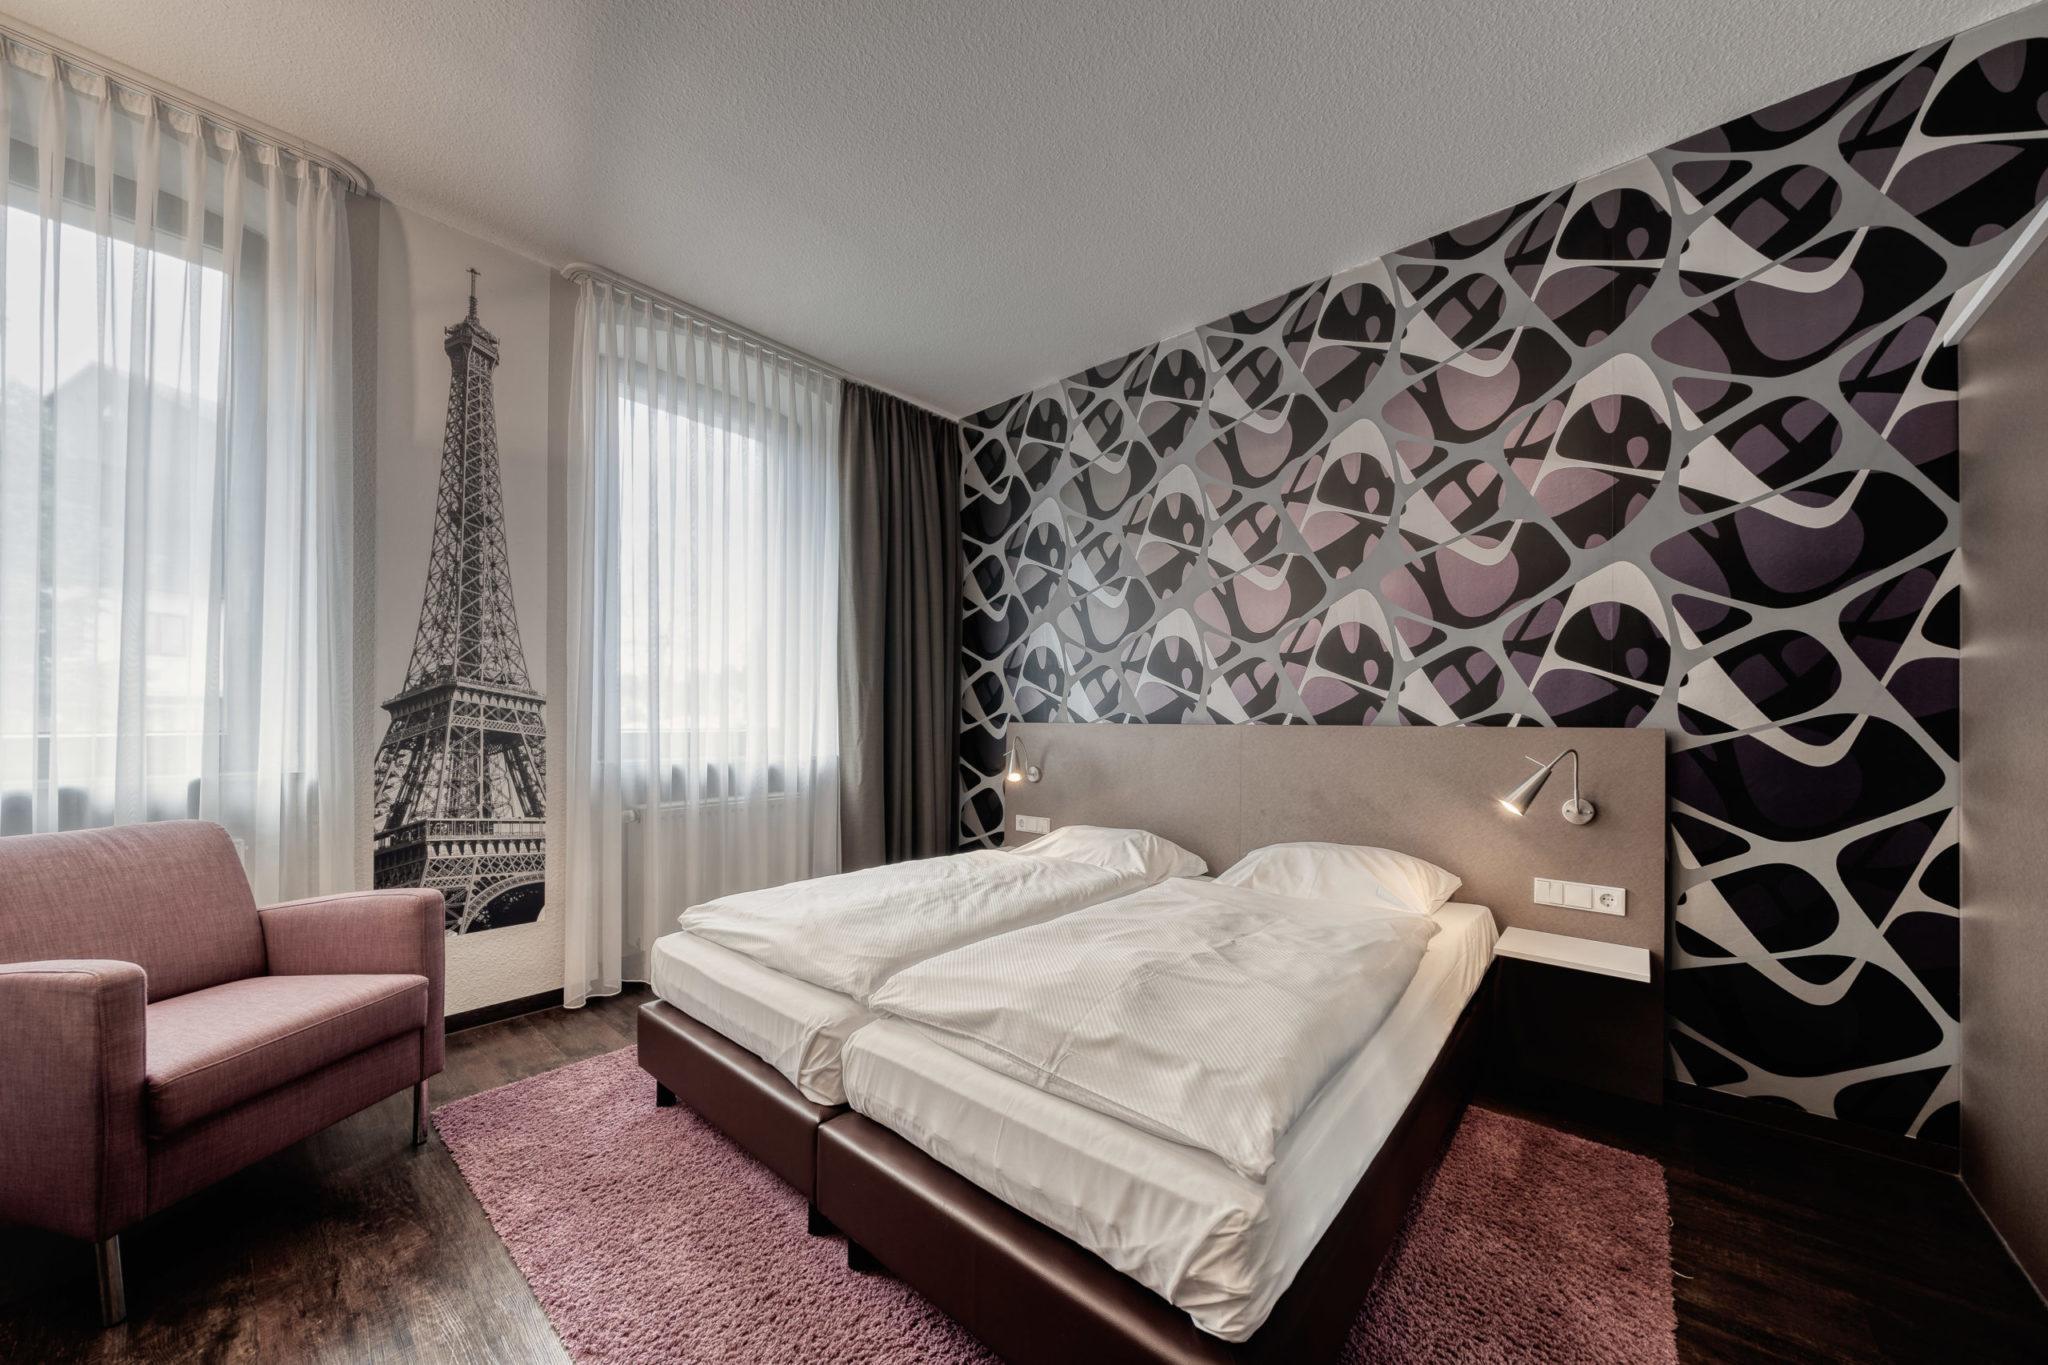 Doppelzimmer Paris Hotel L'adresse